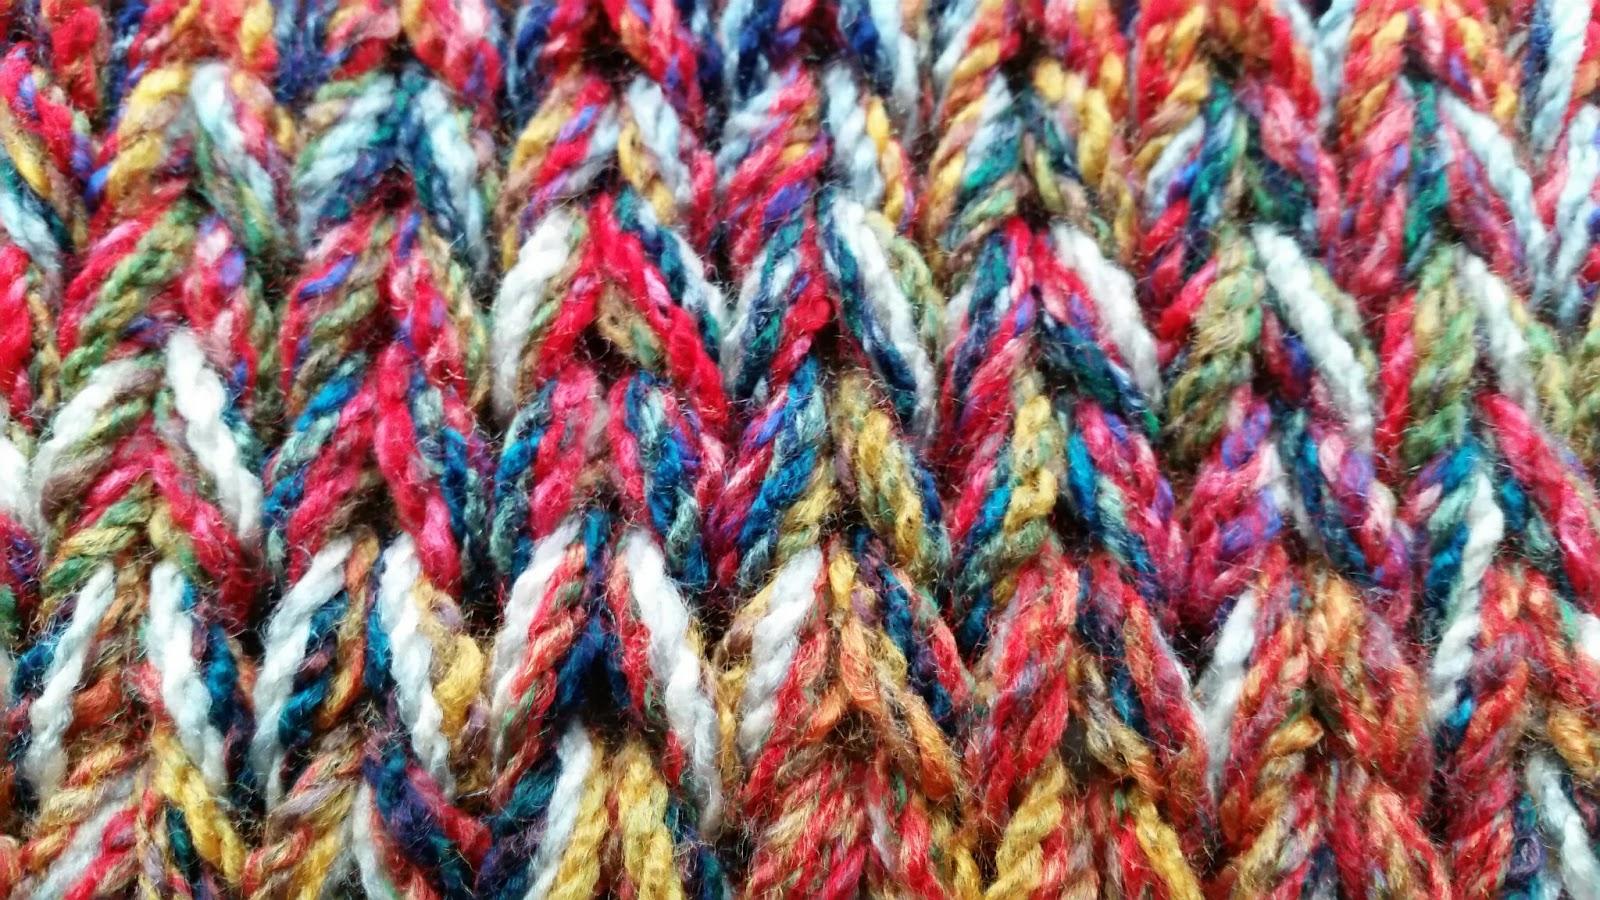 Extreme Knitting Blanket Pattern : Knit-Sew-Grow: Extreme Knitting Blanket